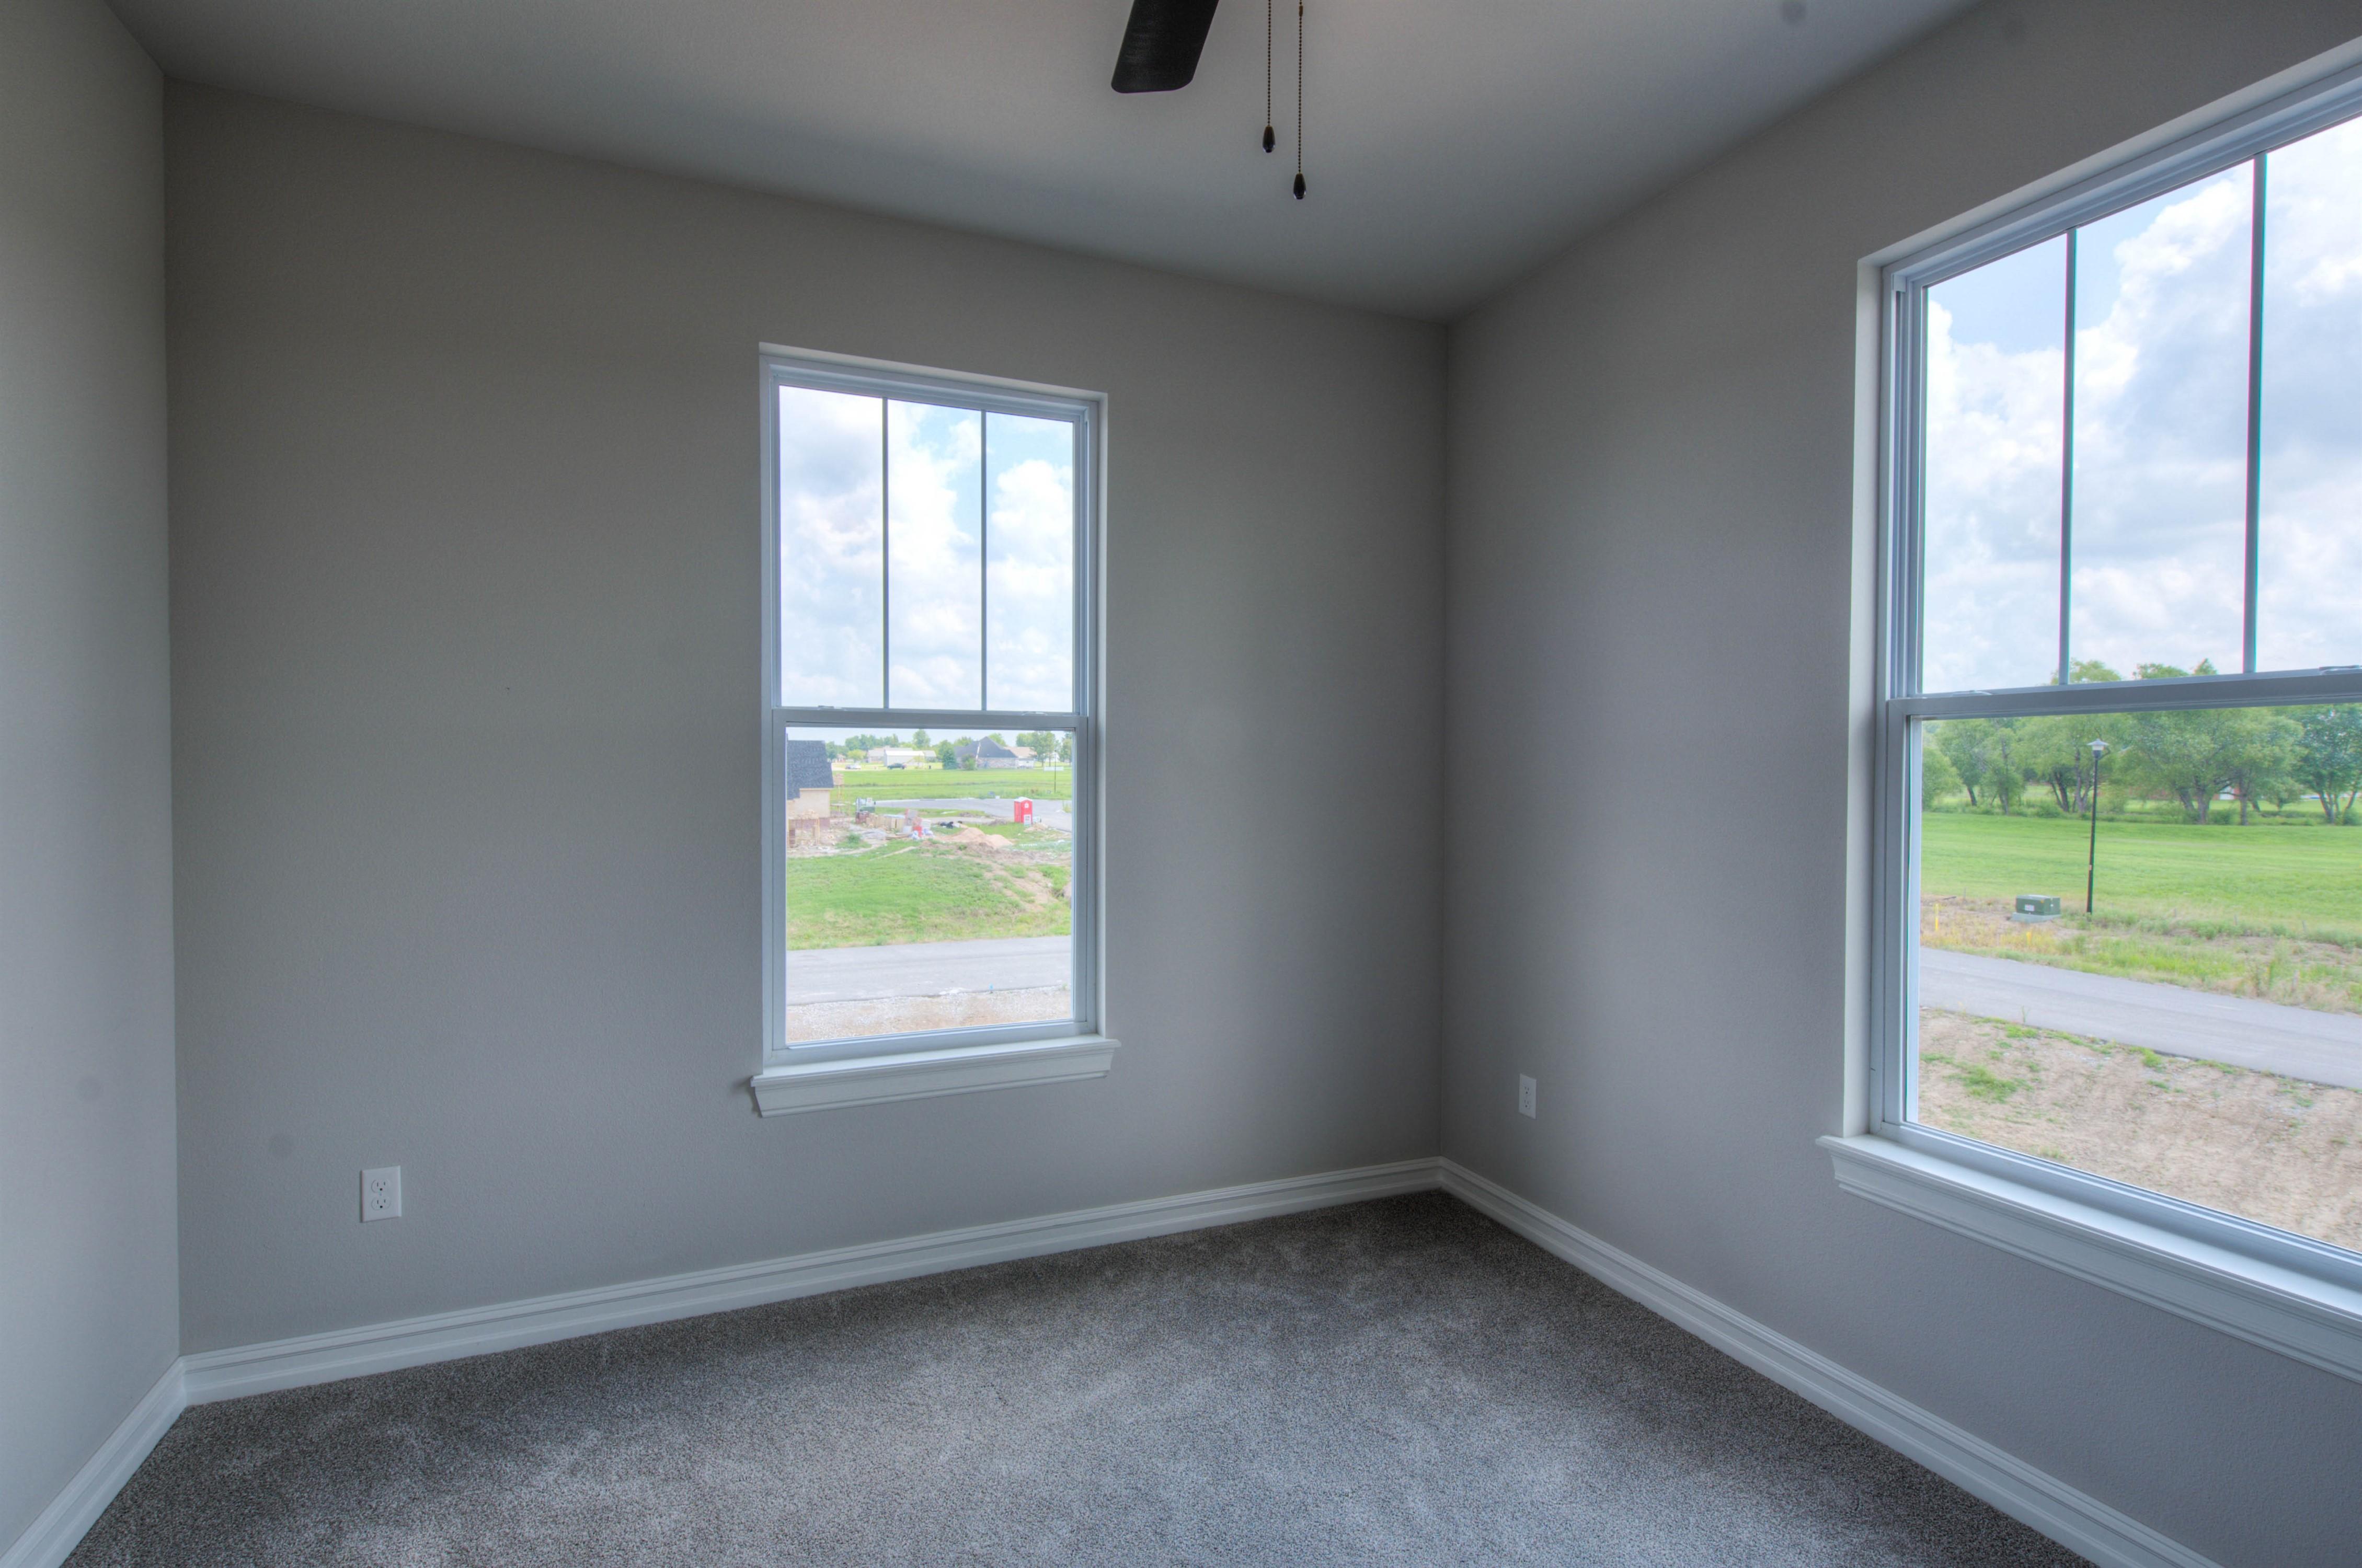 15850 E 107th Street North Property Photo 32